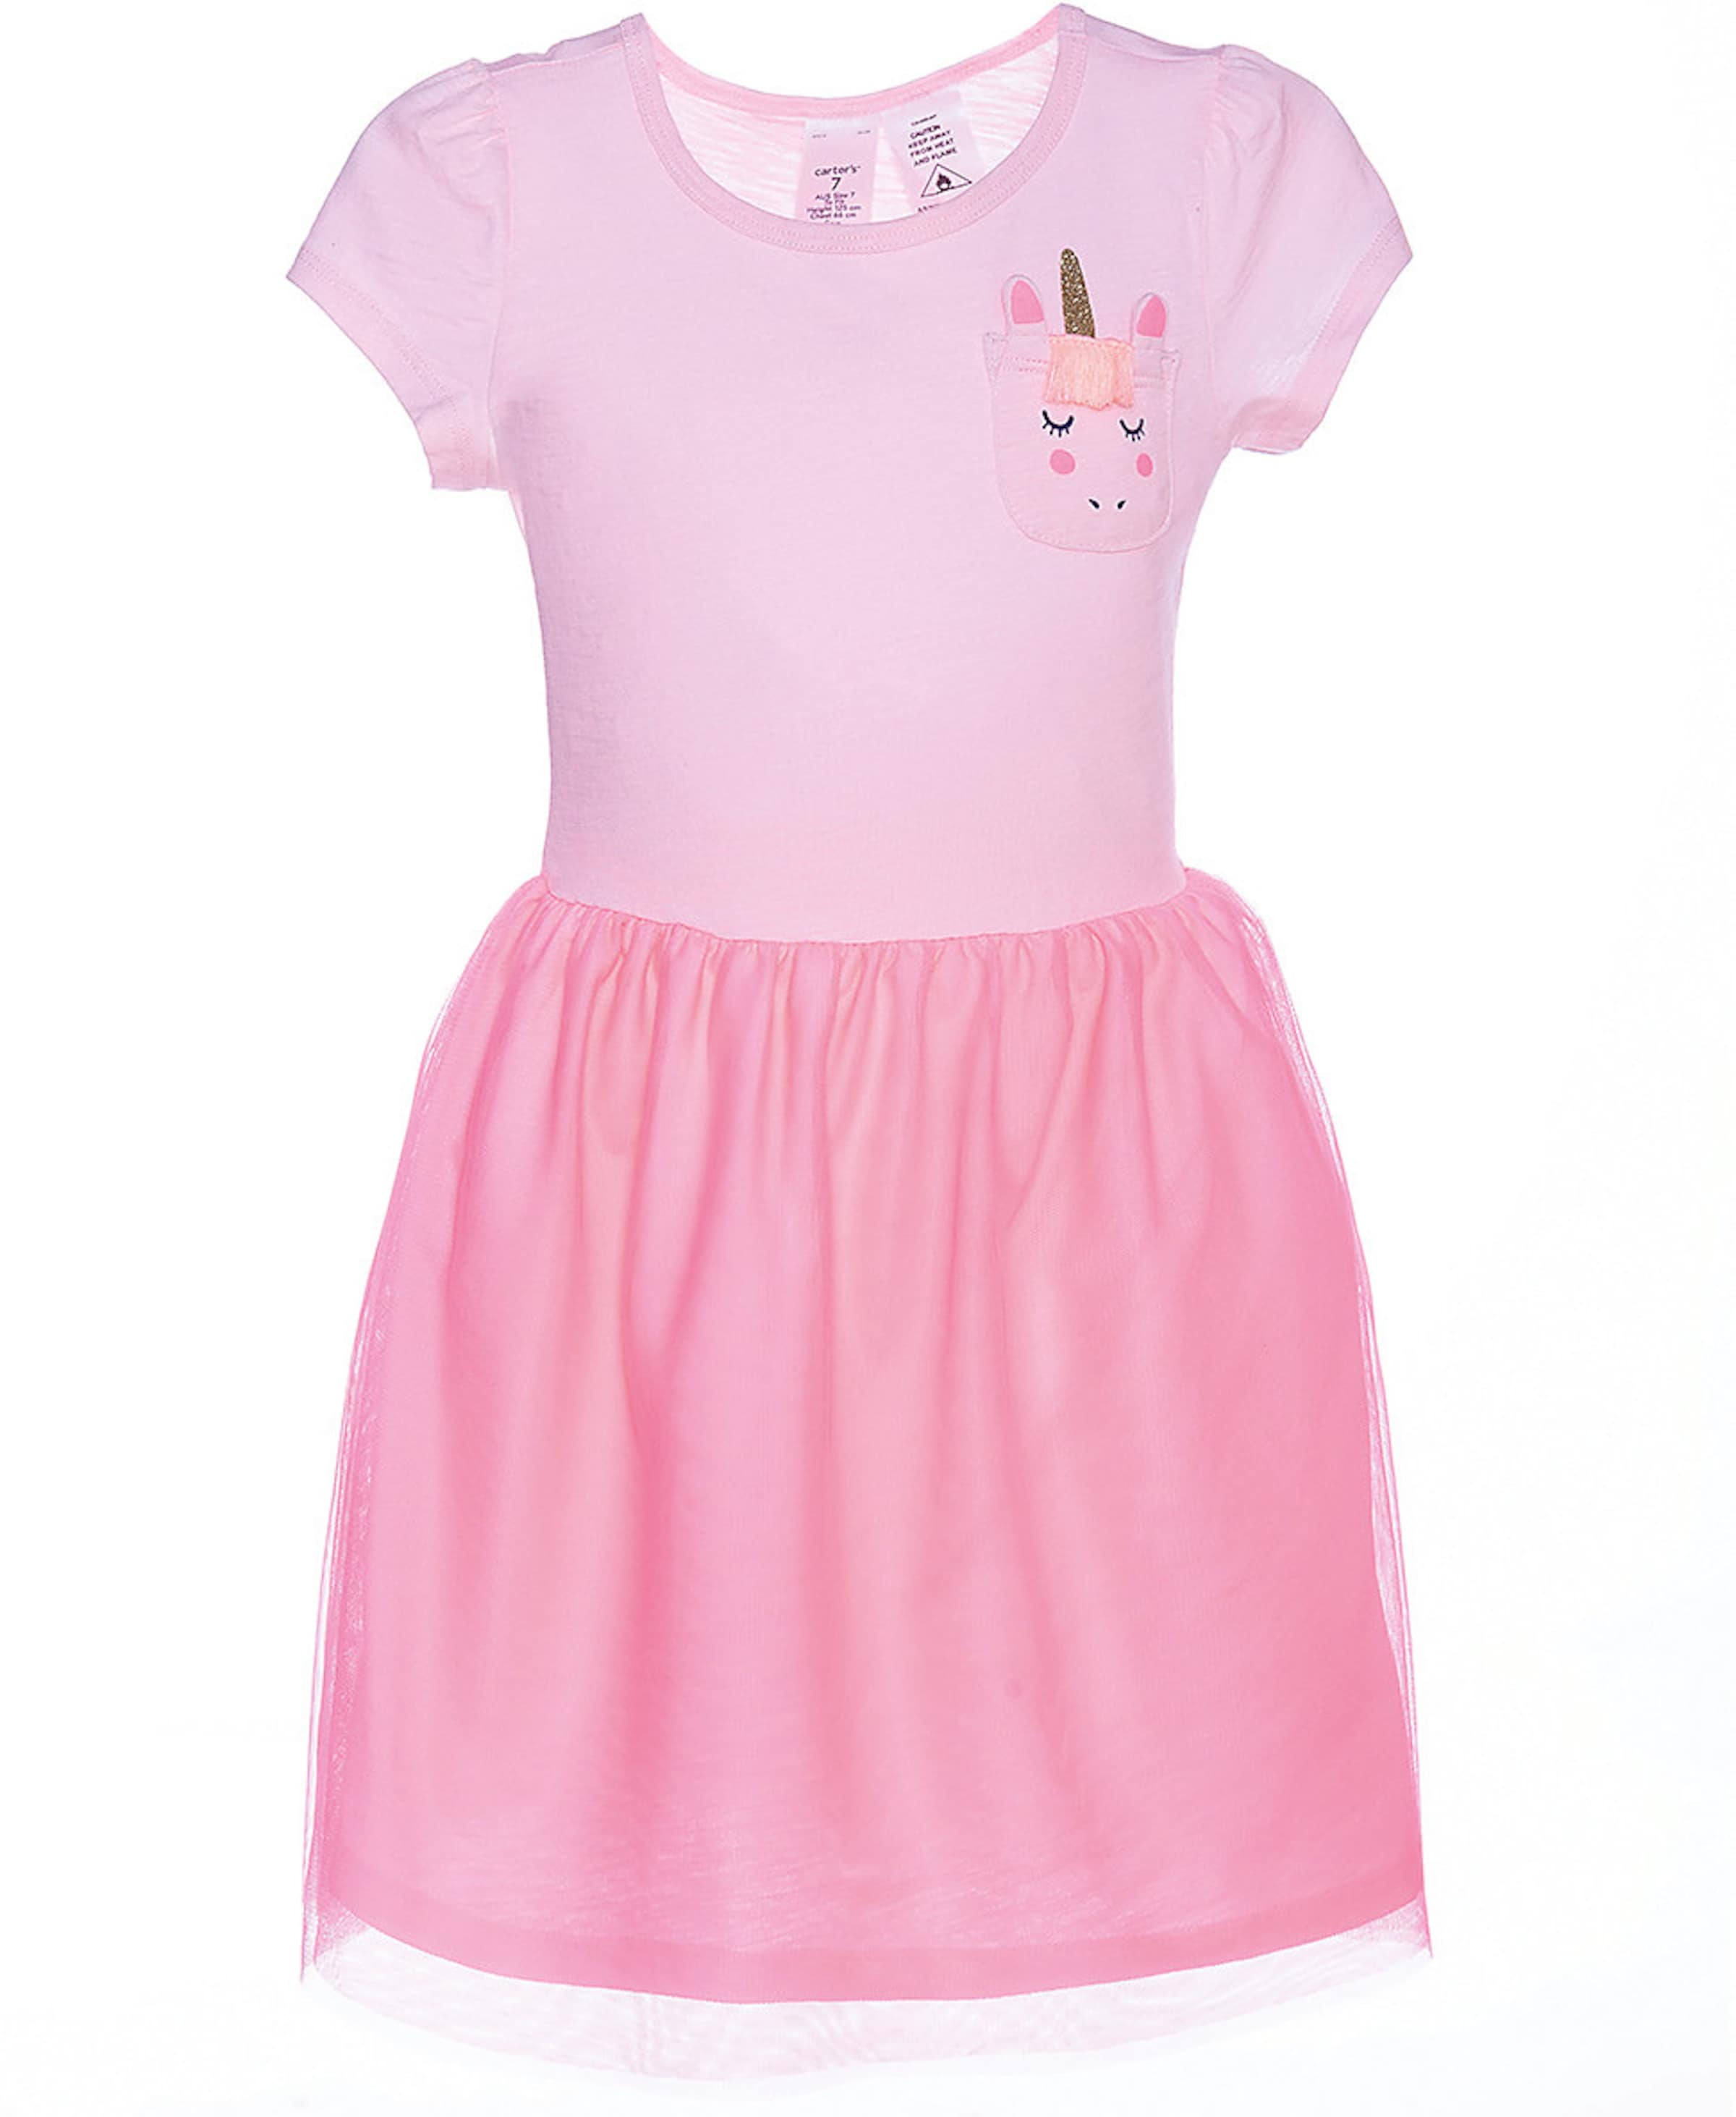 Kinder,  Mädchen,  Kinder Carter's Jerseykleid grau, pink, rot, weiß | 00192135605226